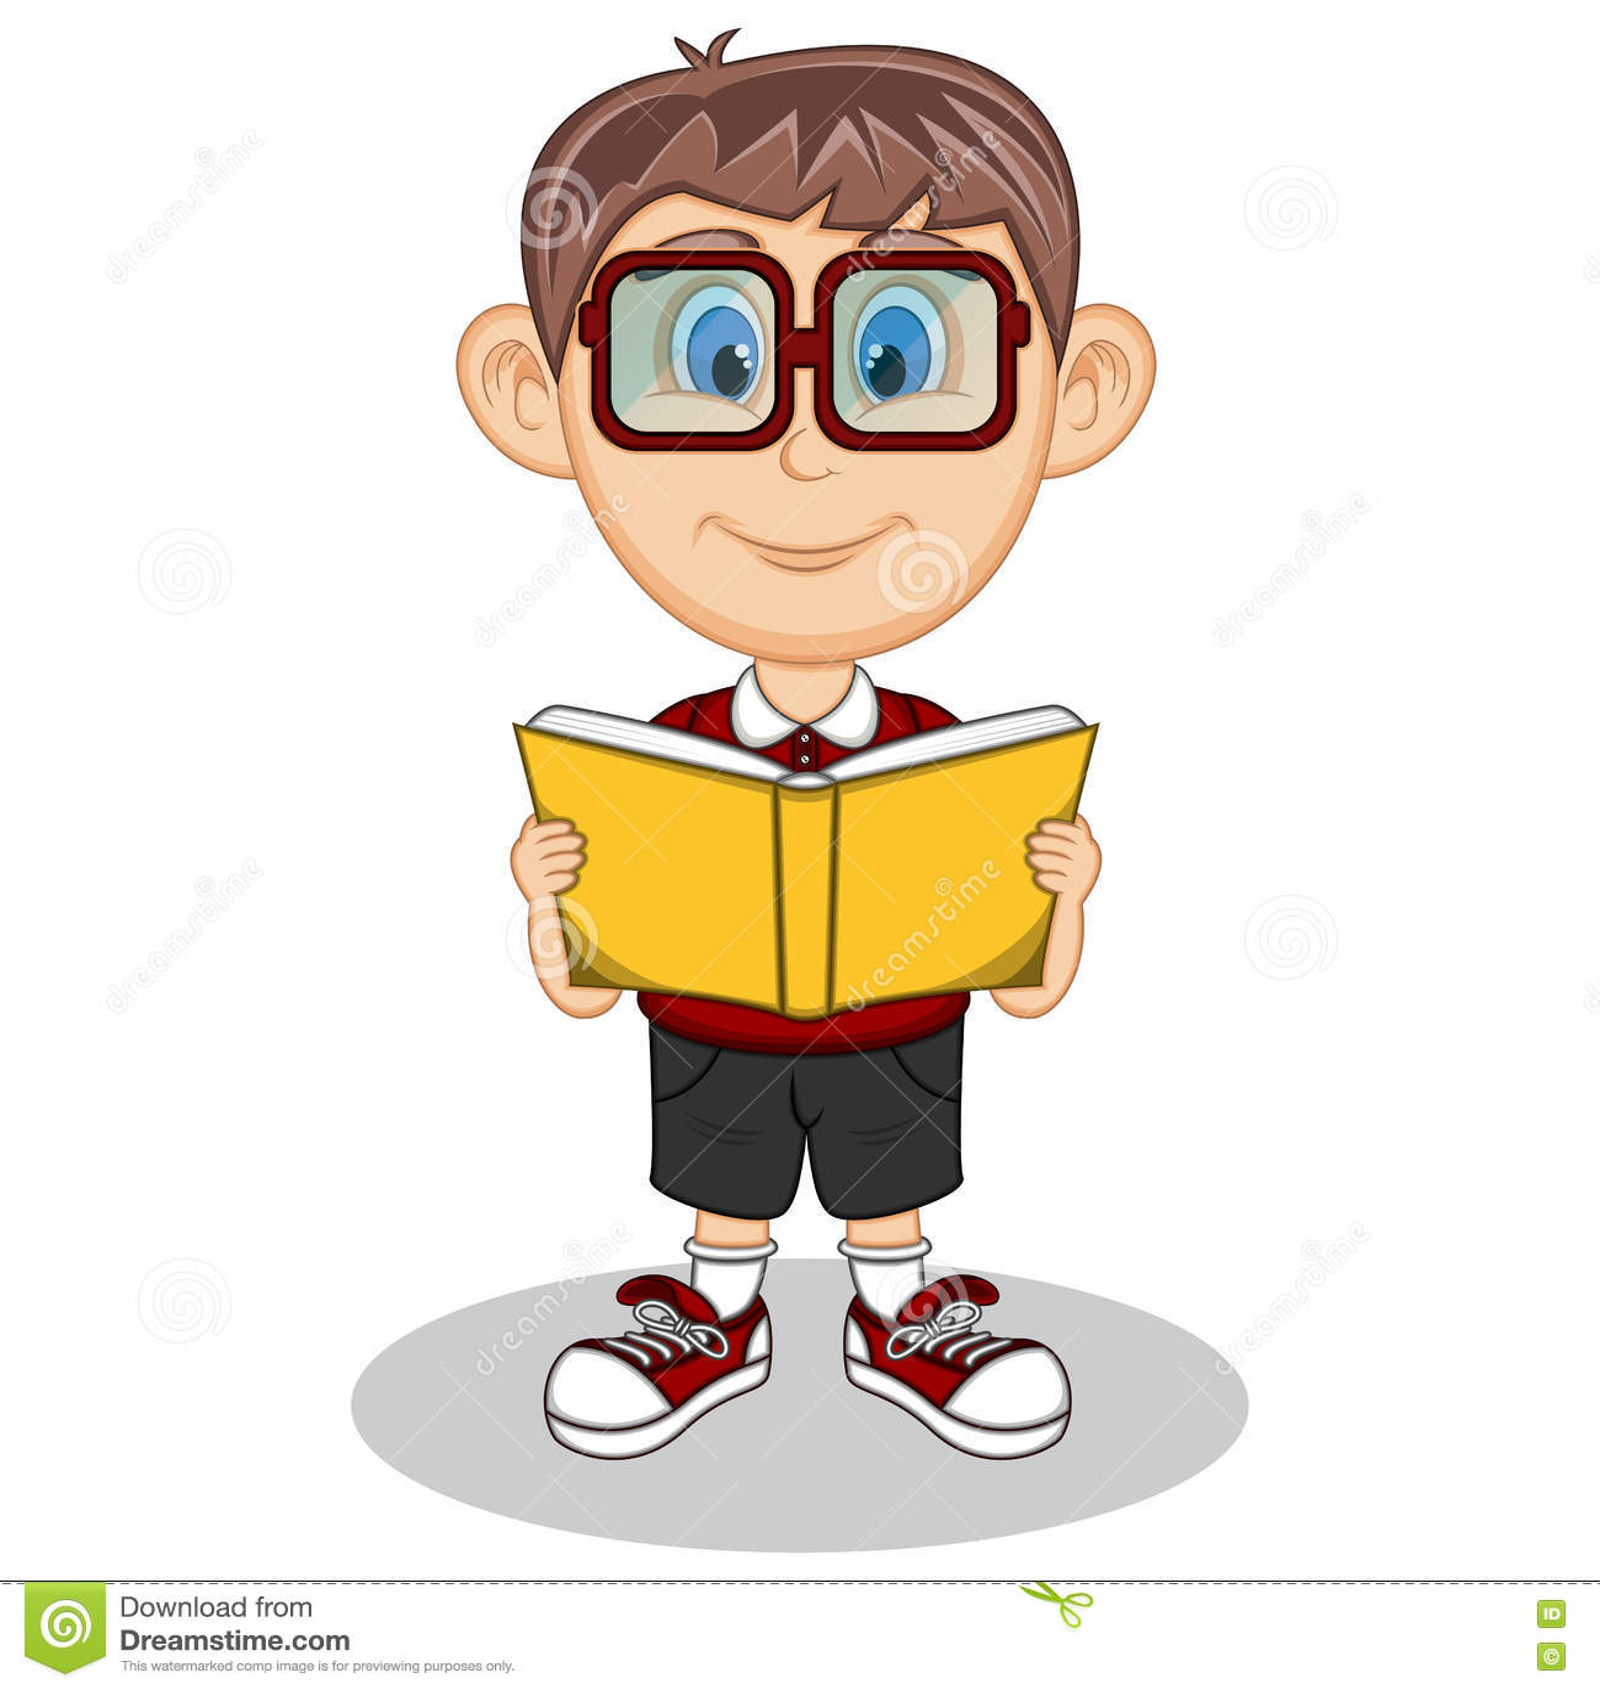 Cartoon boy with glasses